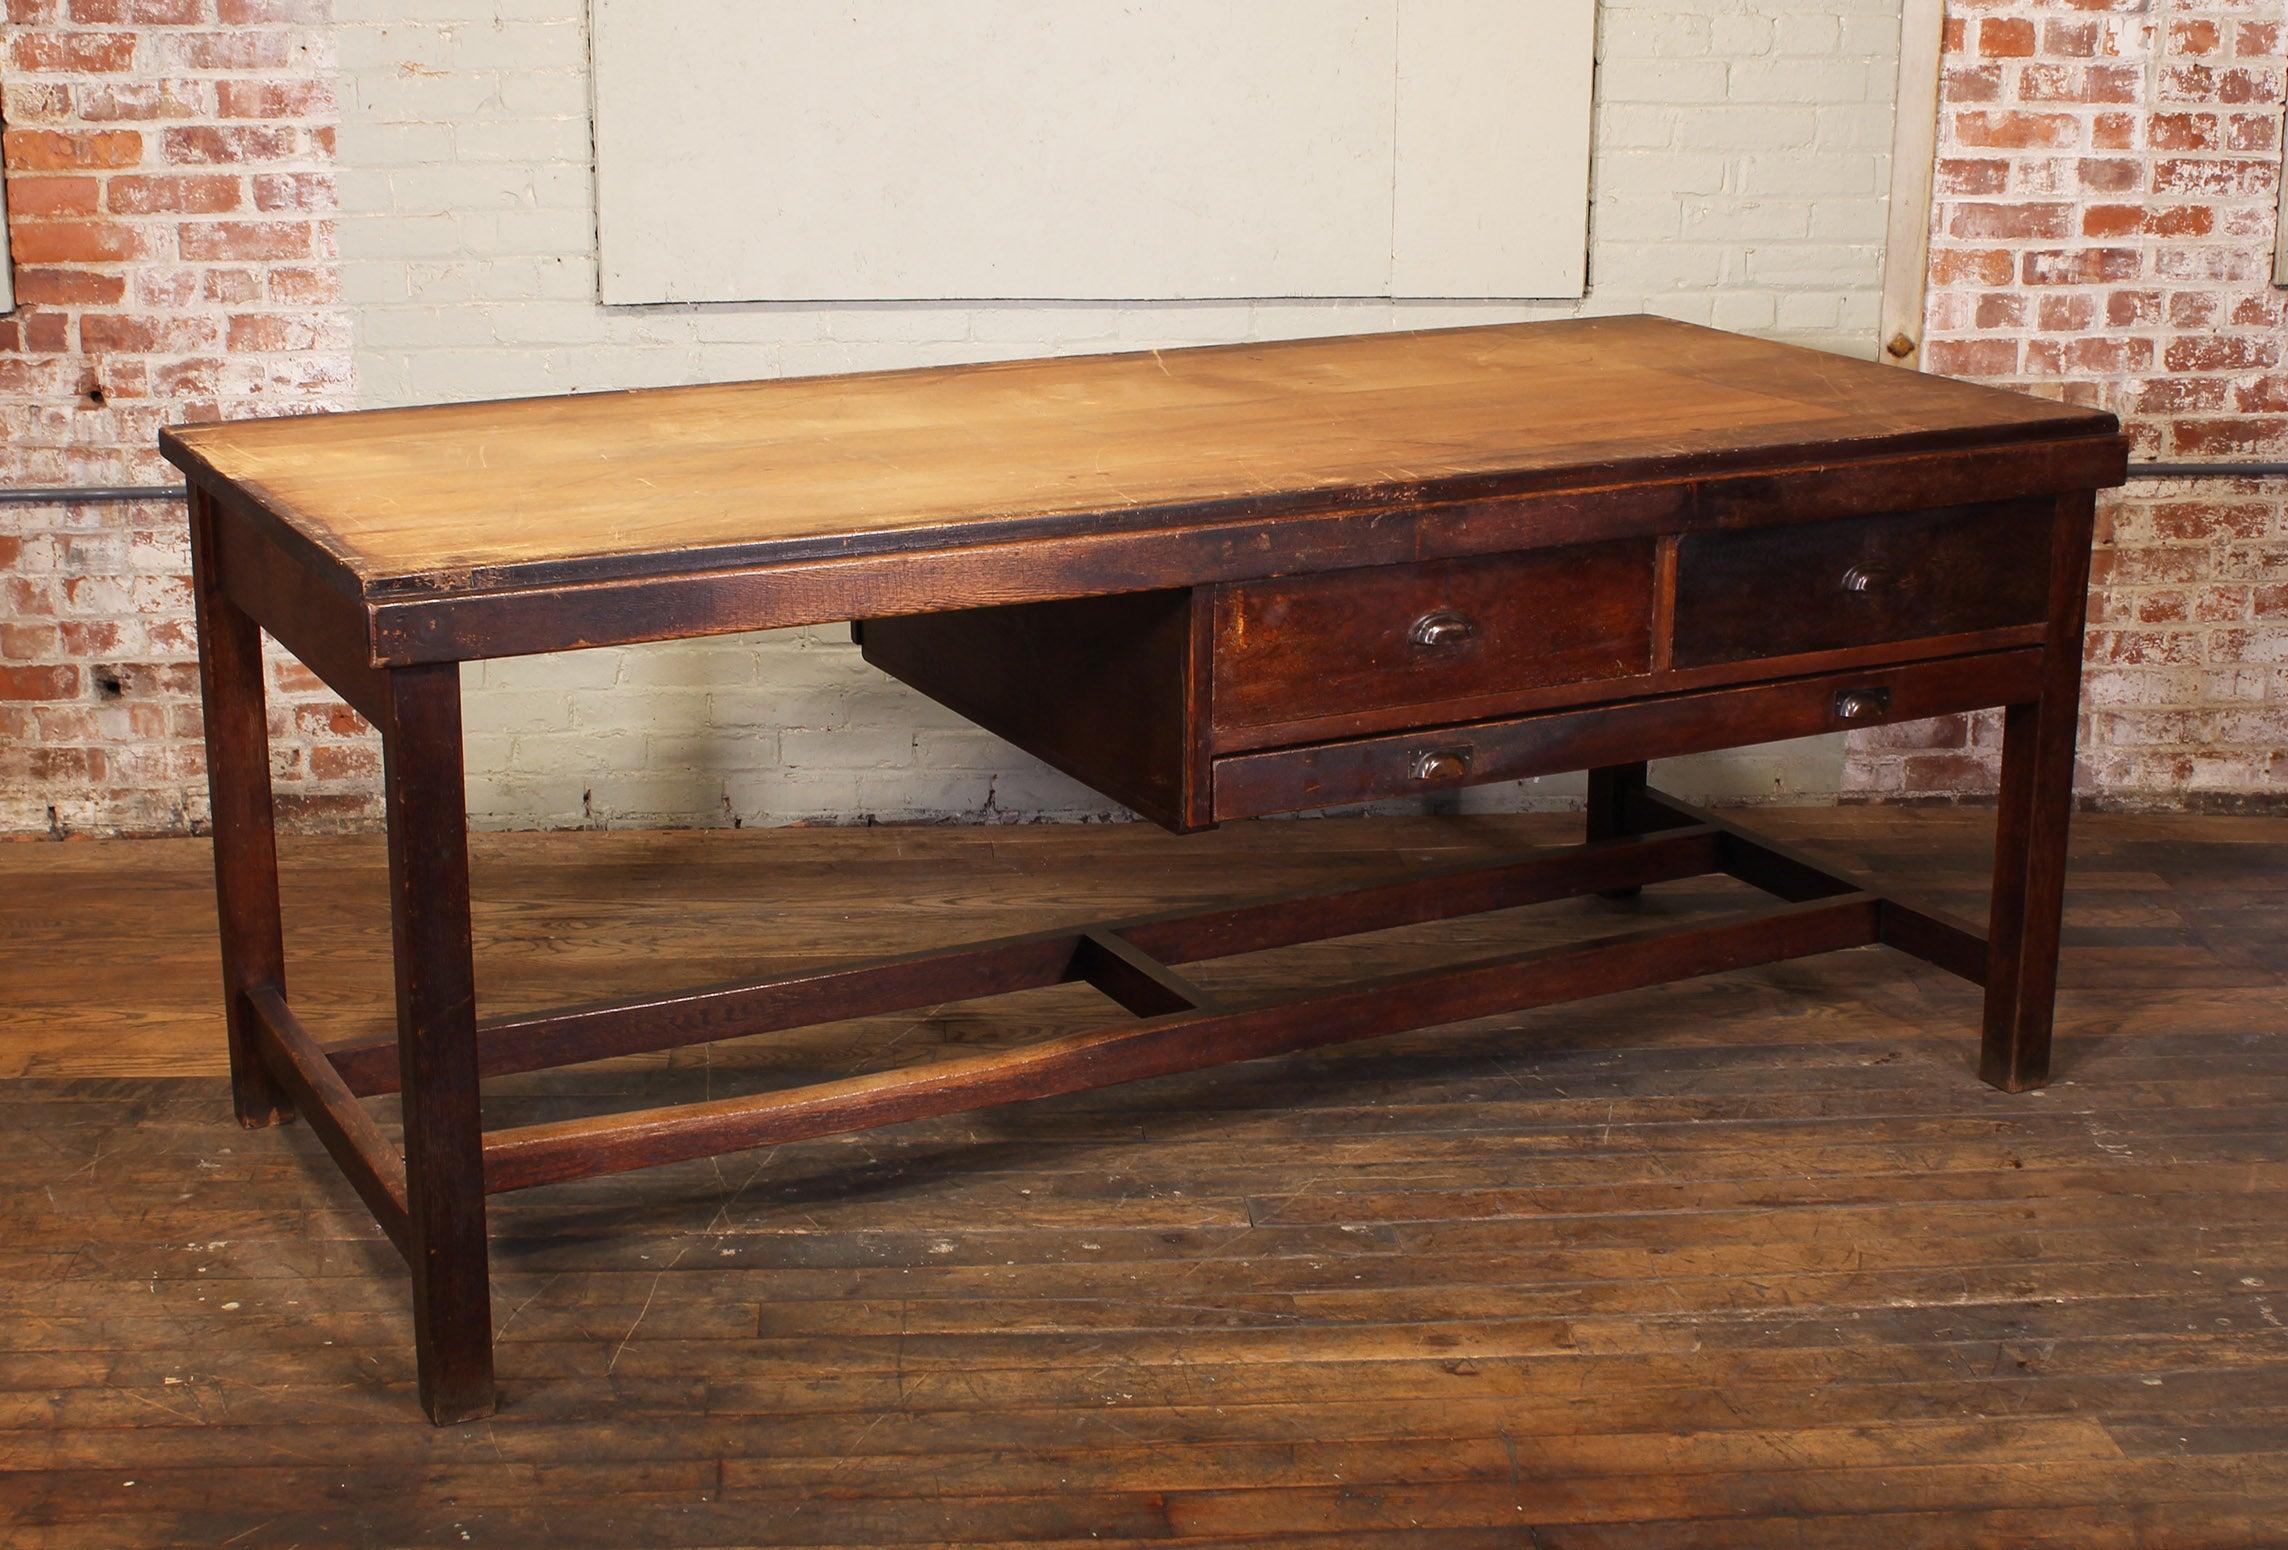 vintage wooden draftsman s desk table with flat file storage rh 1stdibs com vintage wood desk organizer vintage wood desk chair replacement parts